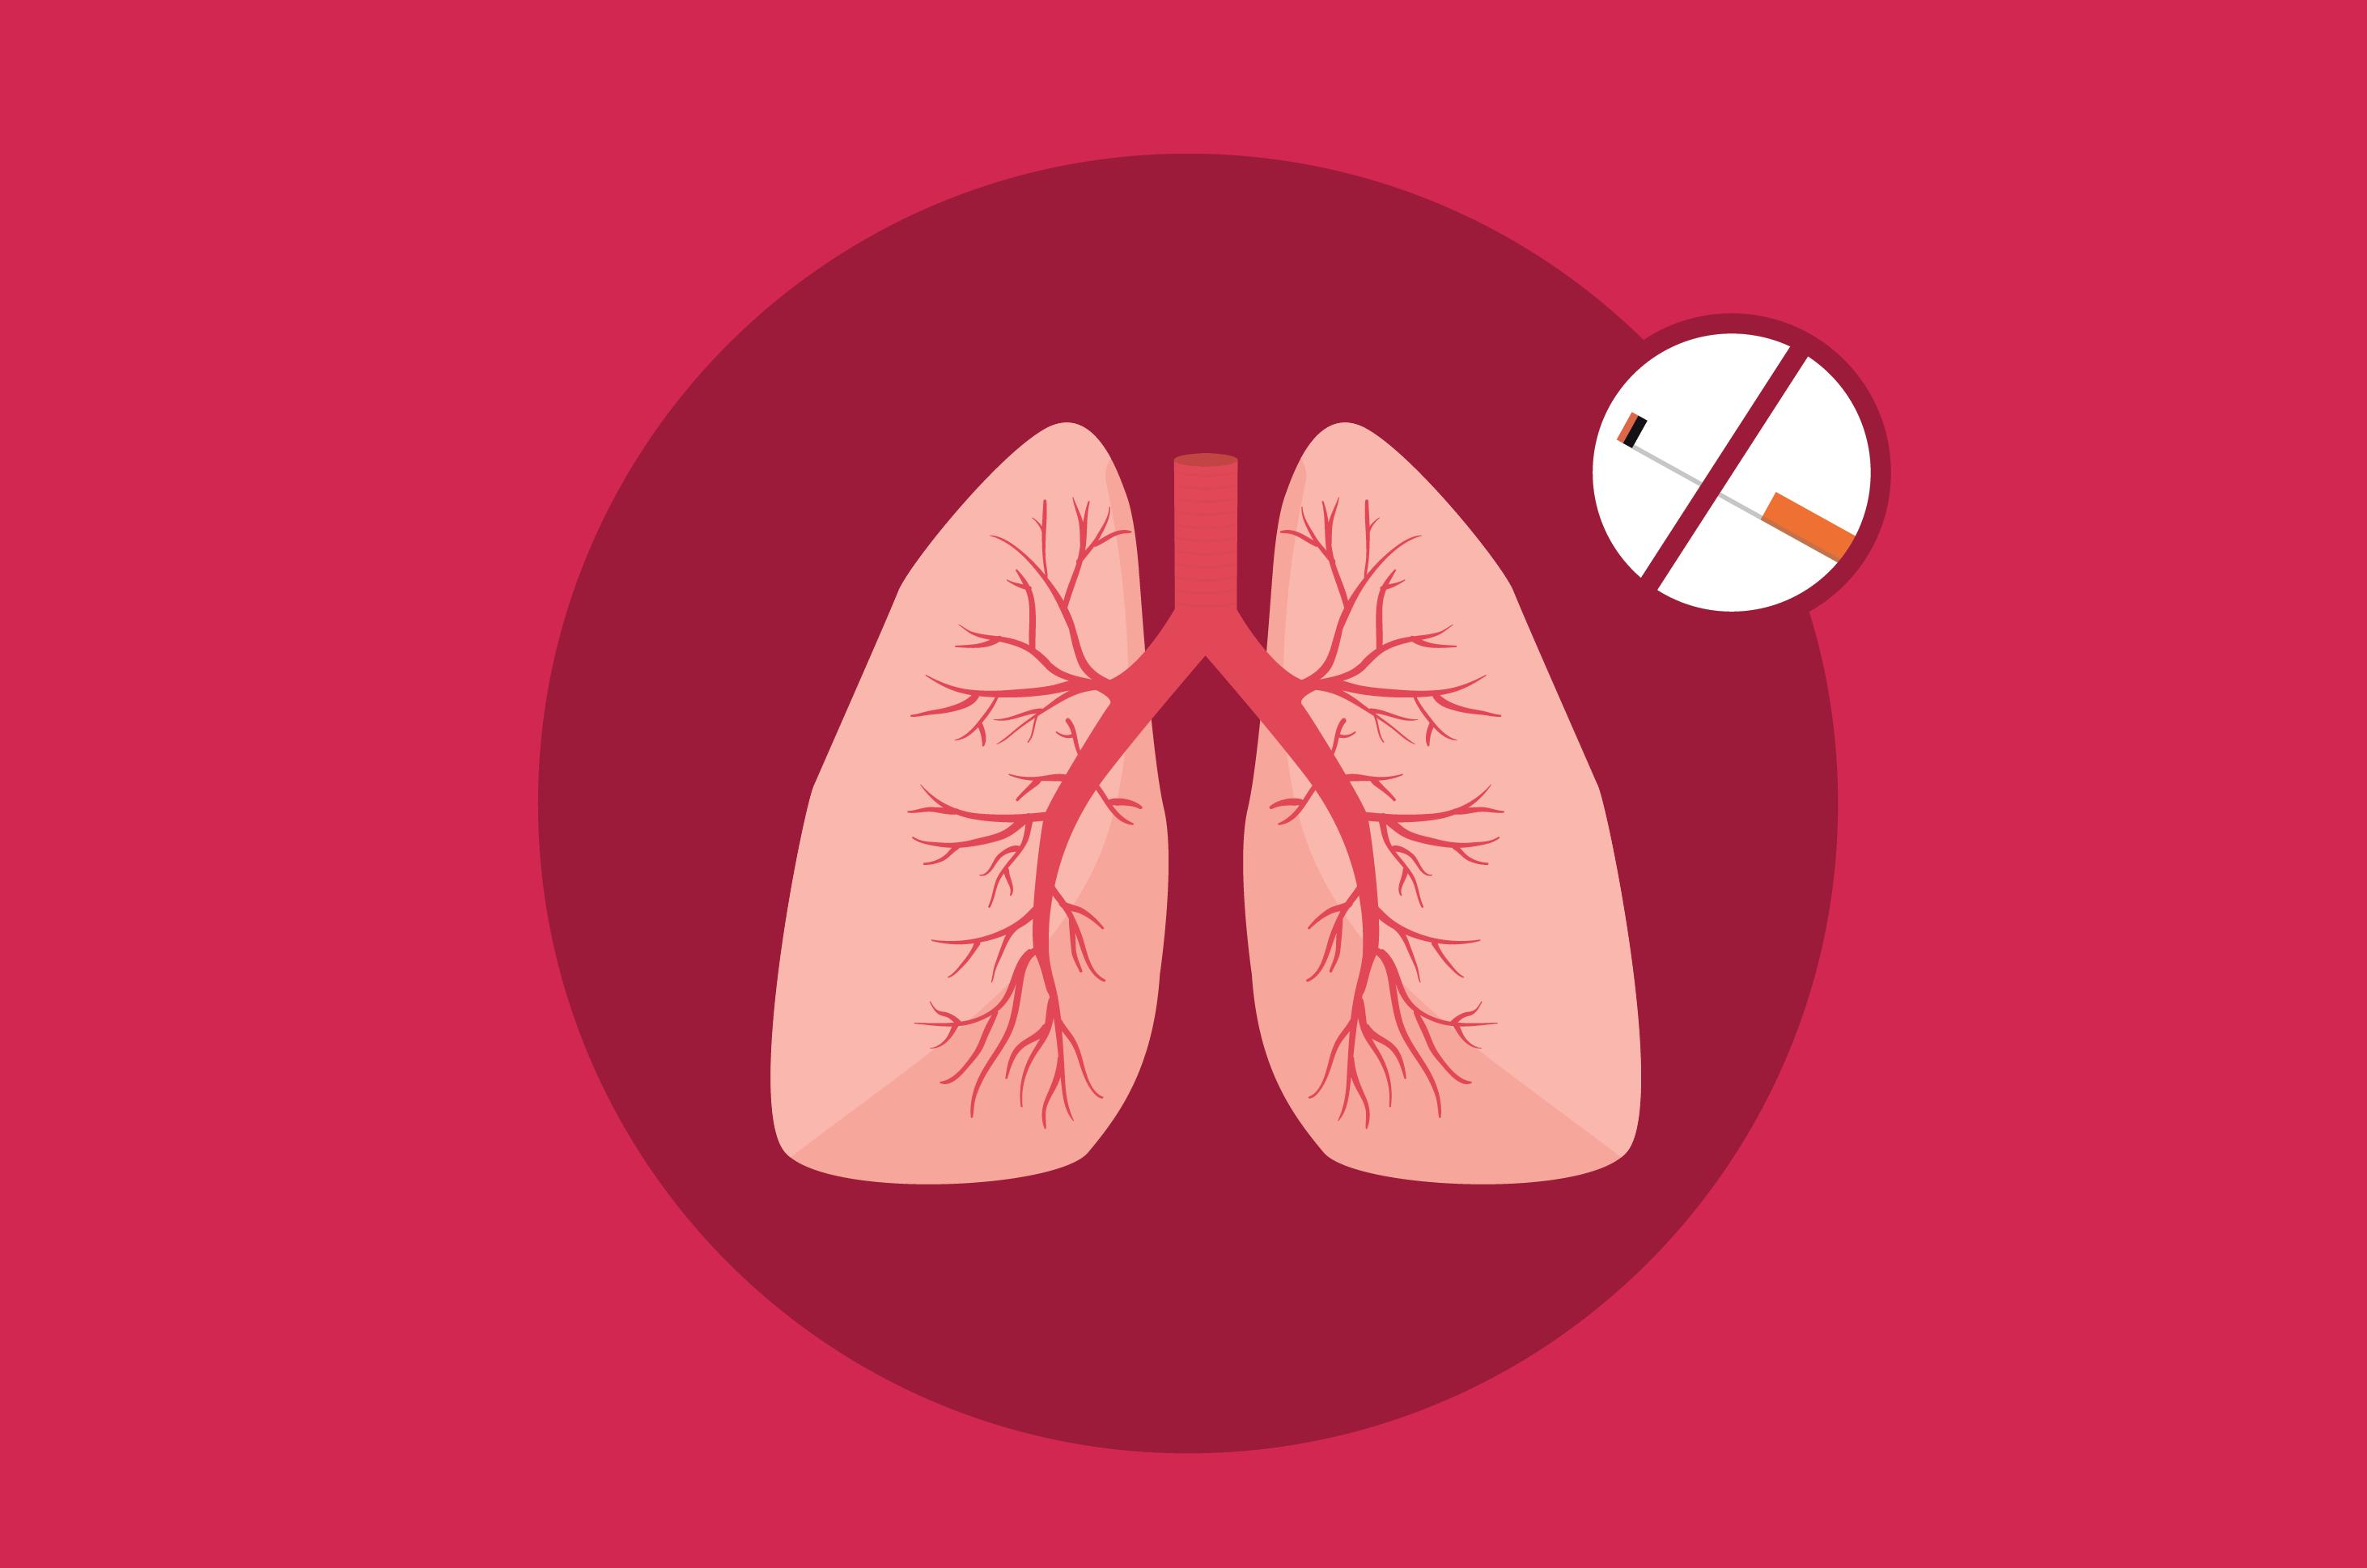 Selain Merokok, Kebiasaan Ini Menjadi Penyebab Infeksi pada Paru-Paru